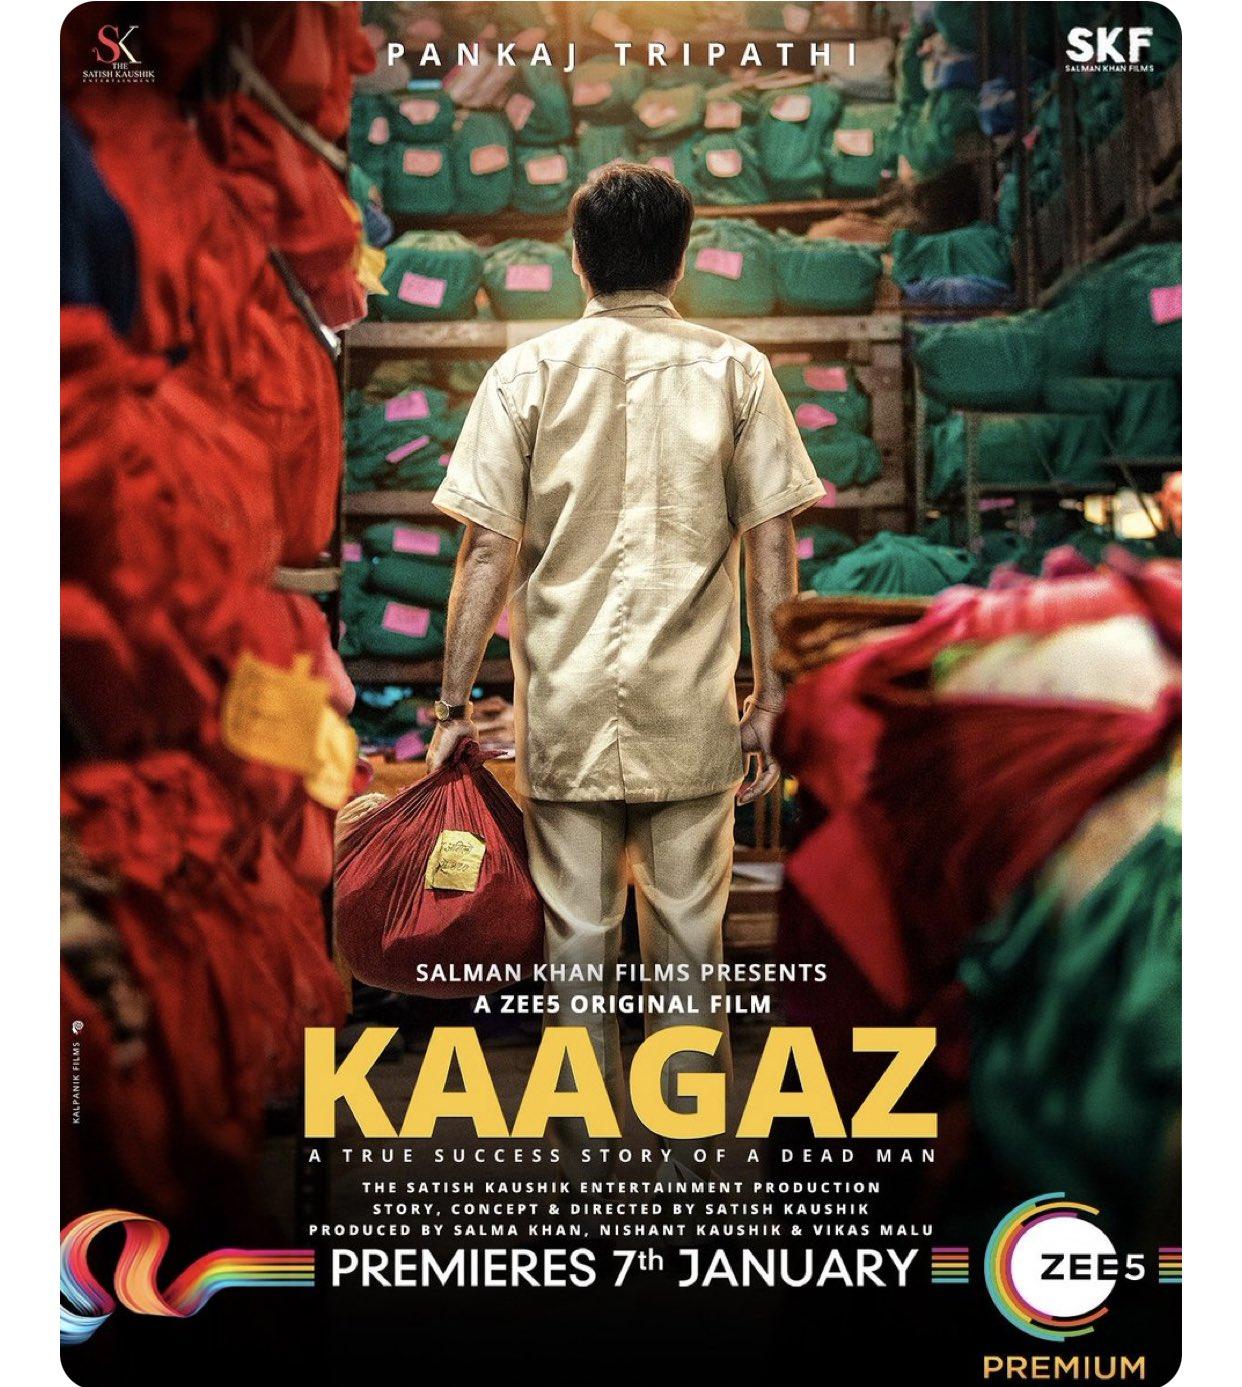 Pankaj Tripathi Kaagaz(2021): Released Date, Cast, Poster, Trailer and Reviews.